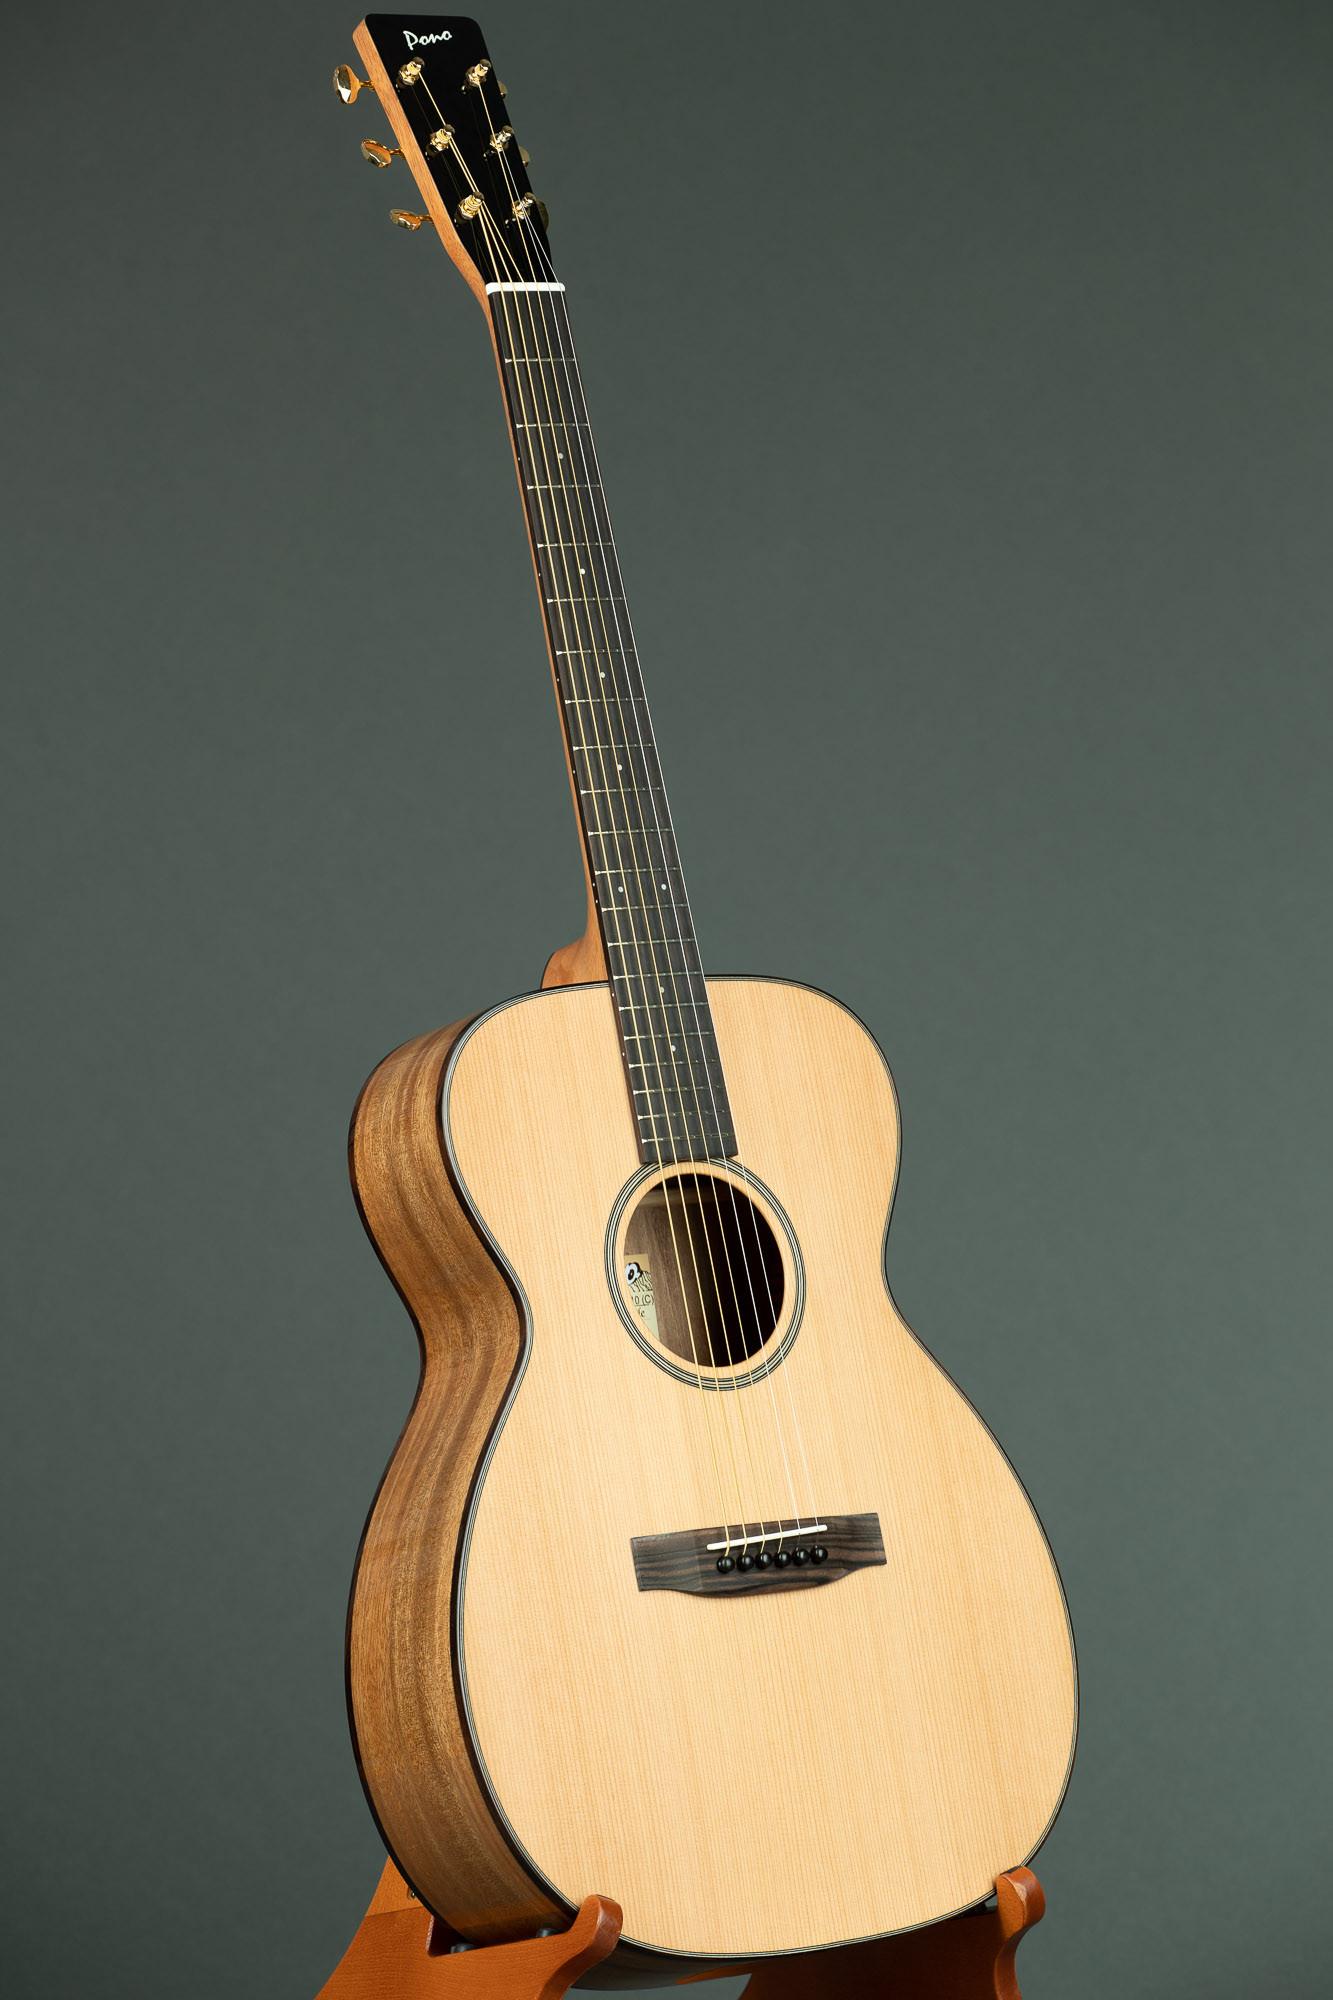 Pono Cedar Top Acacia OM Steel String Guitar (OM-10C 3390)